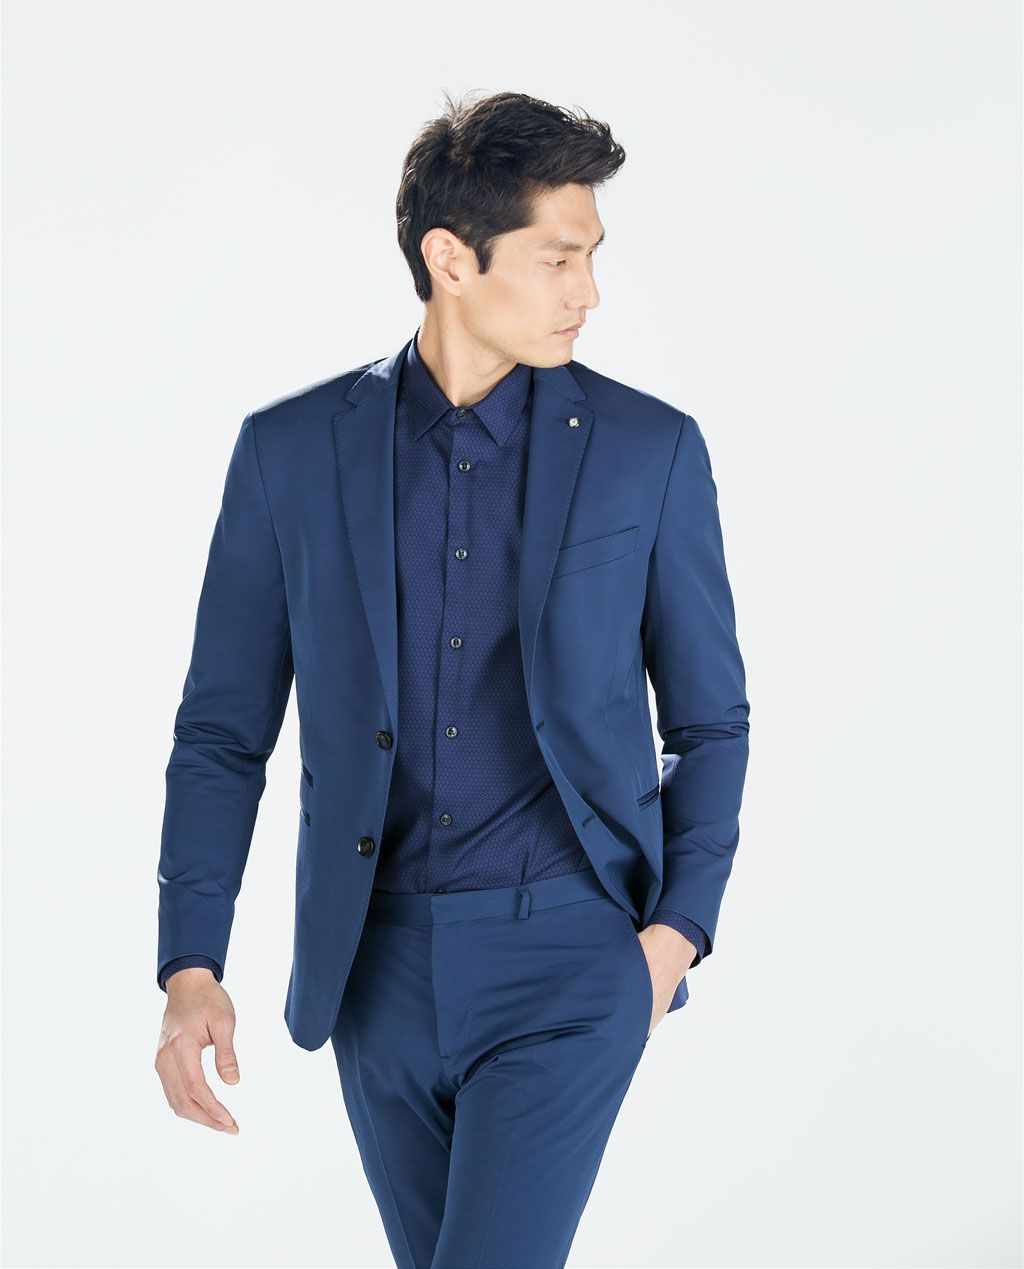 9f00aaf34f04 DARK BLUE SUIT-Suits-MAN